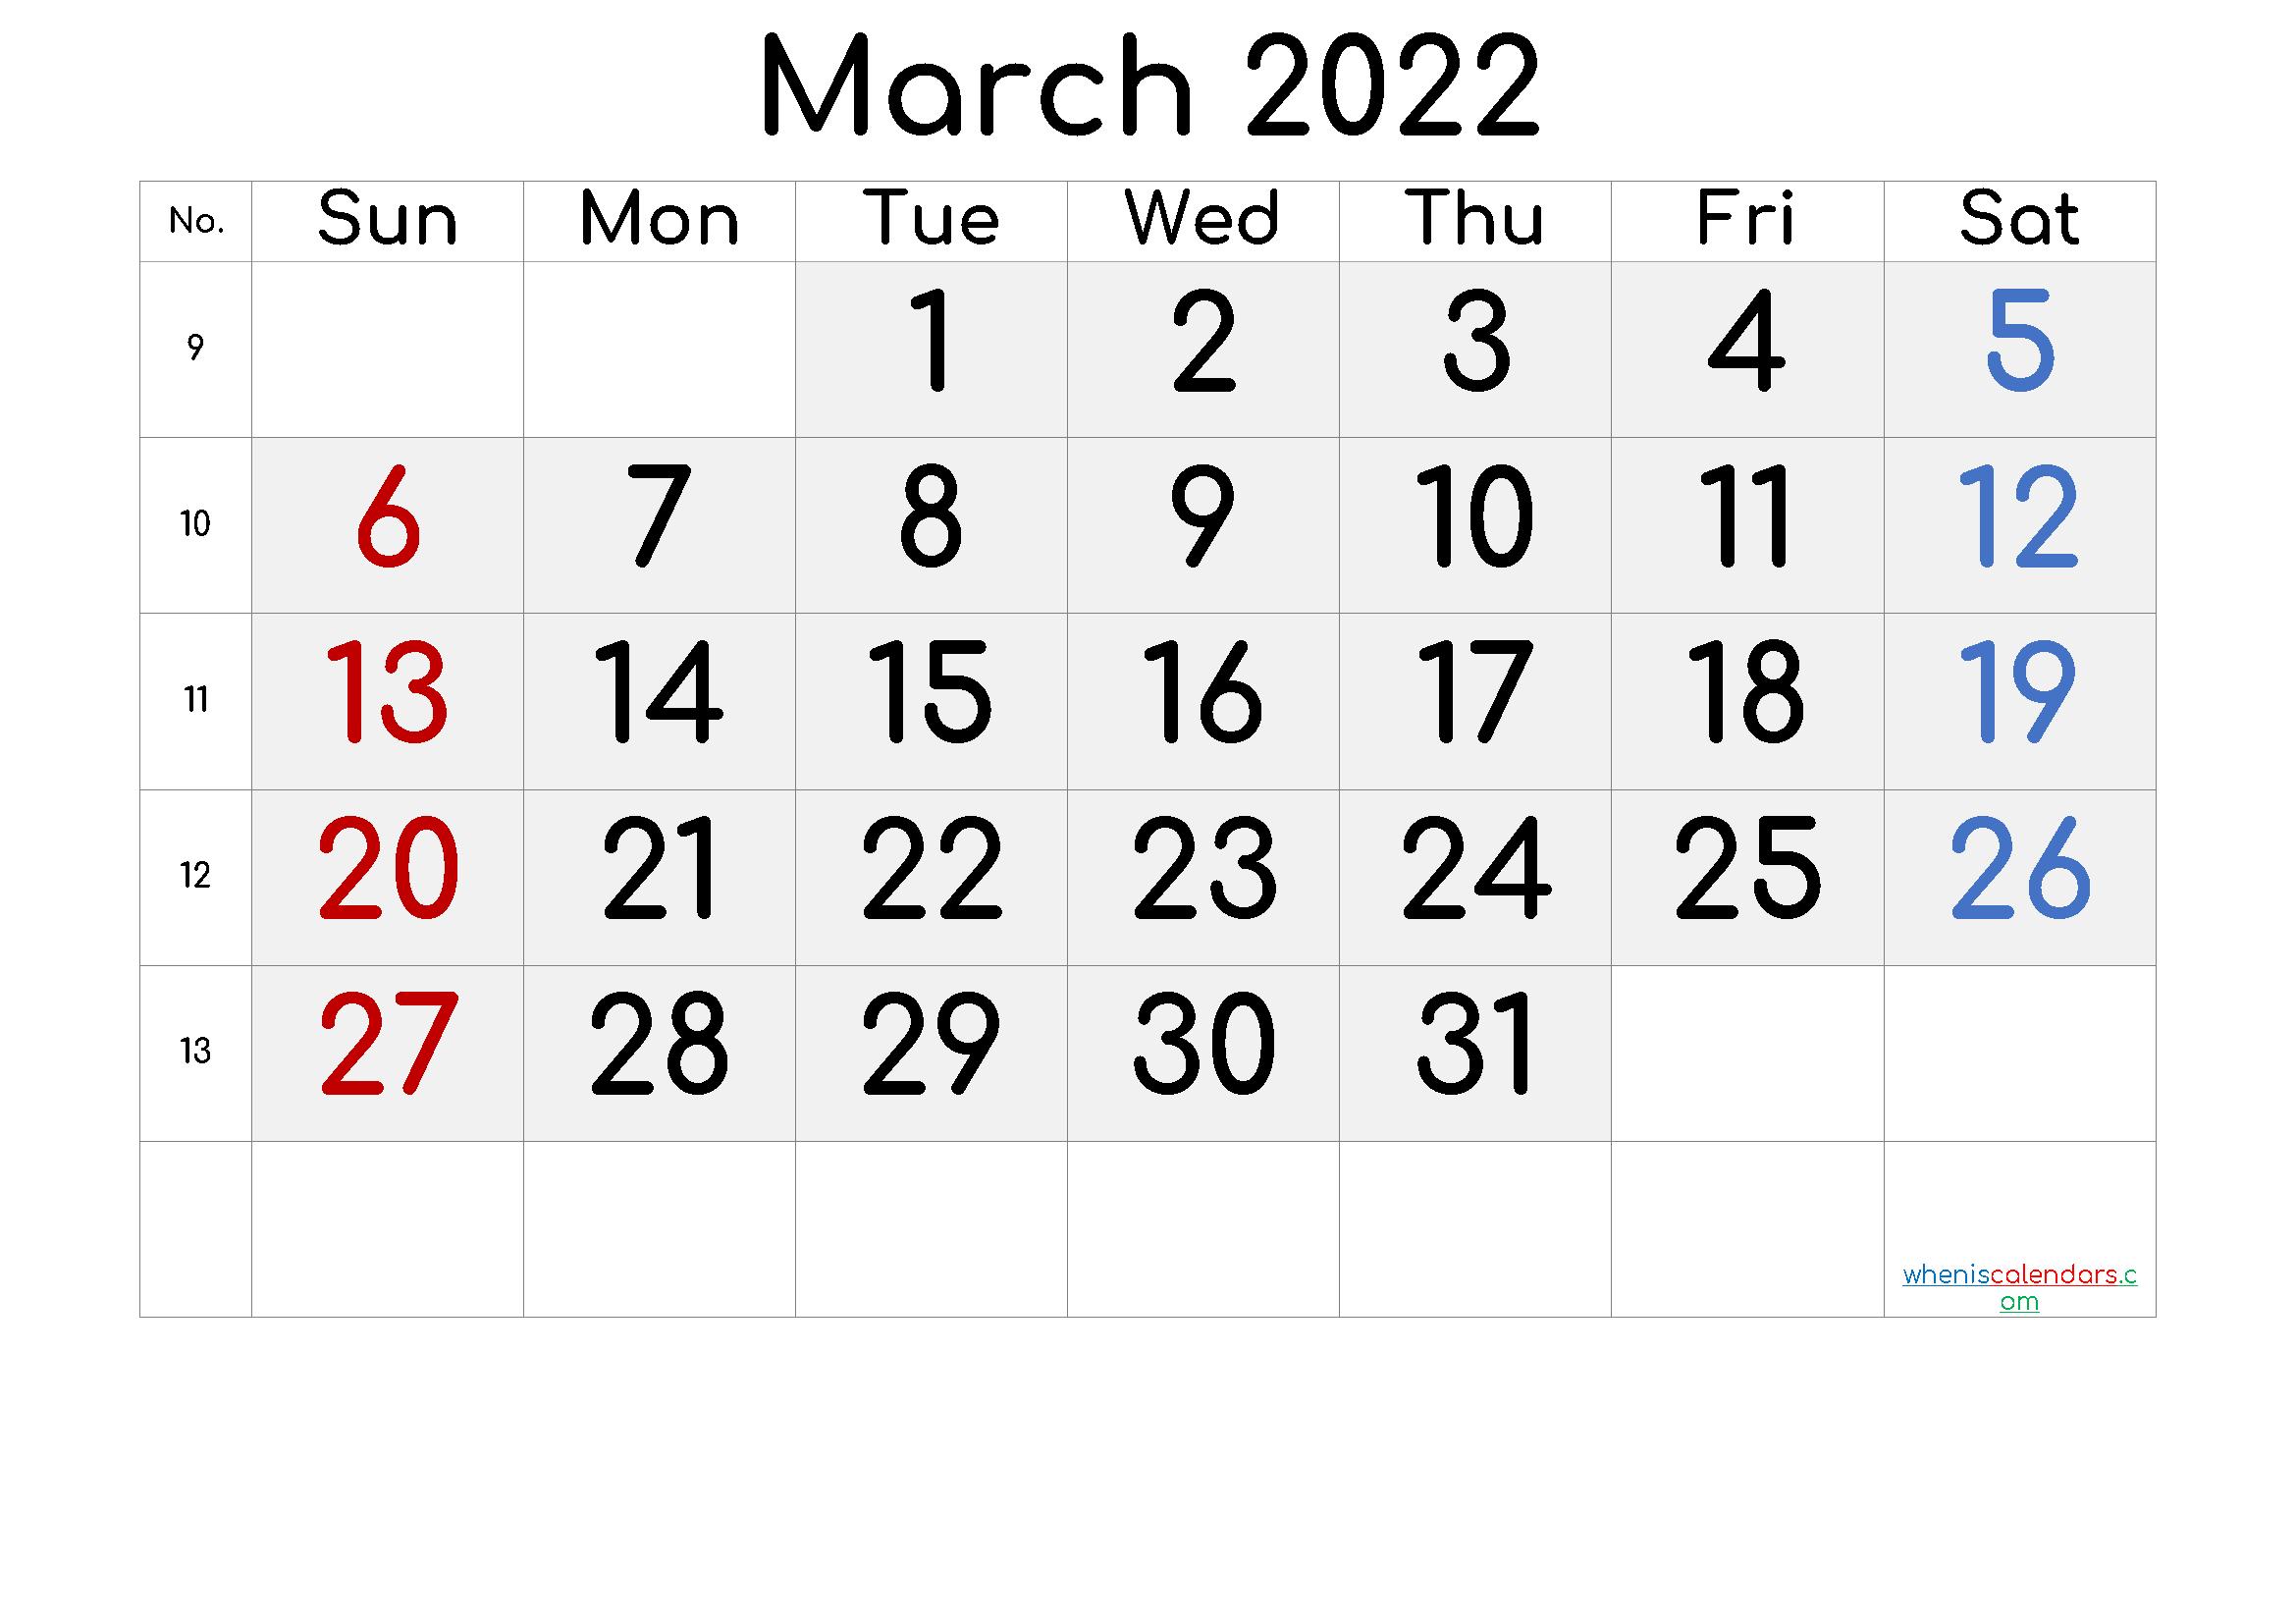 2022 March Free Printable Calendar [Free Premium] Intended For March 2022 Calendar Free Printable